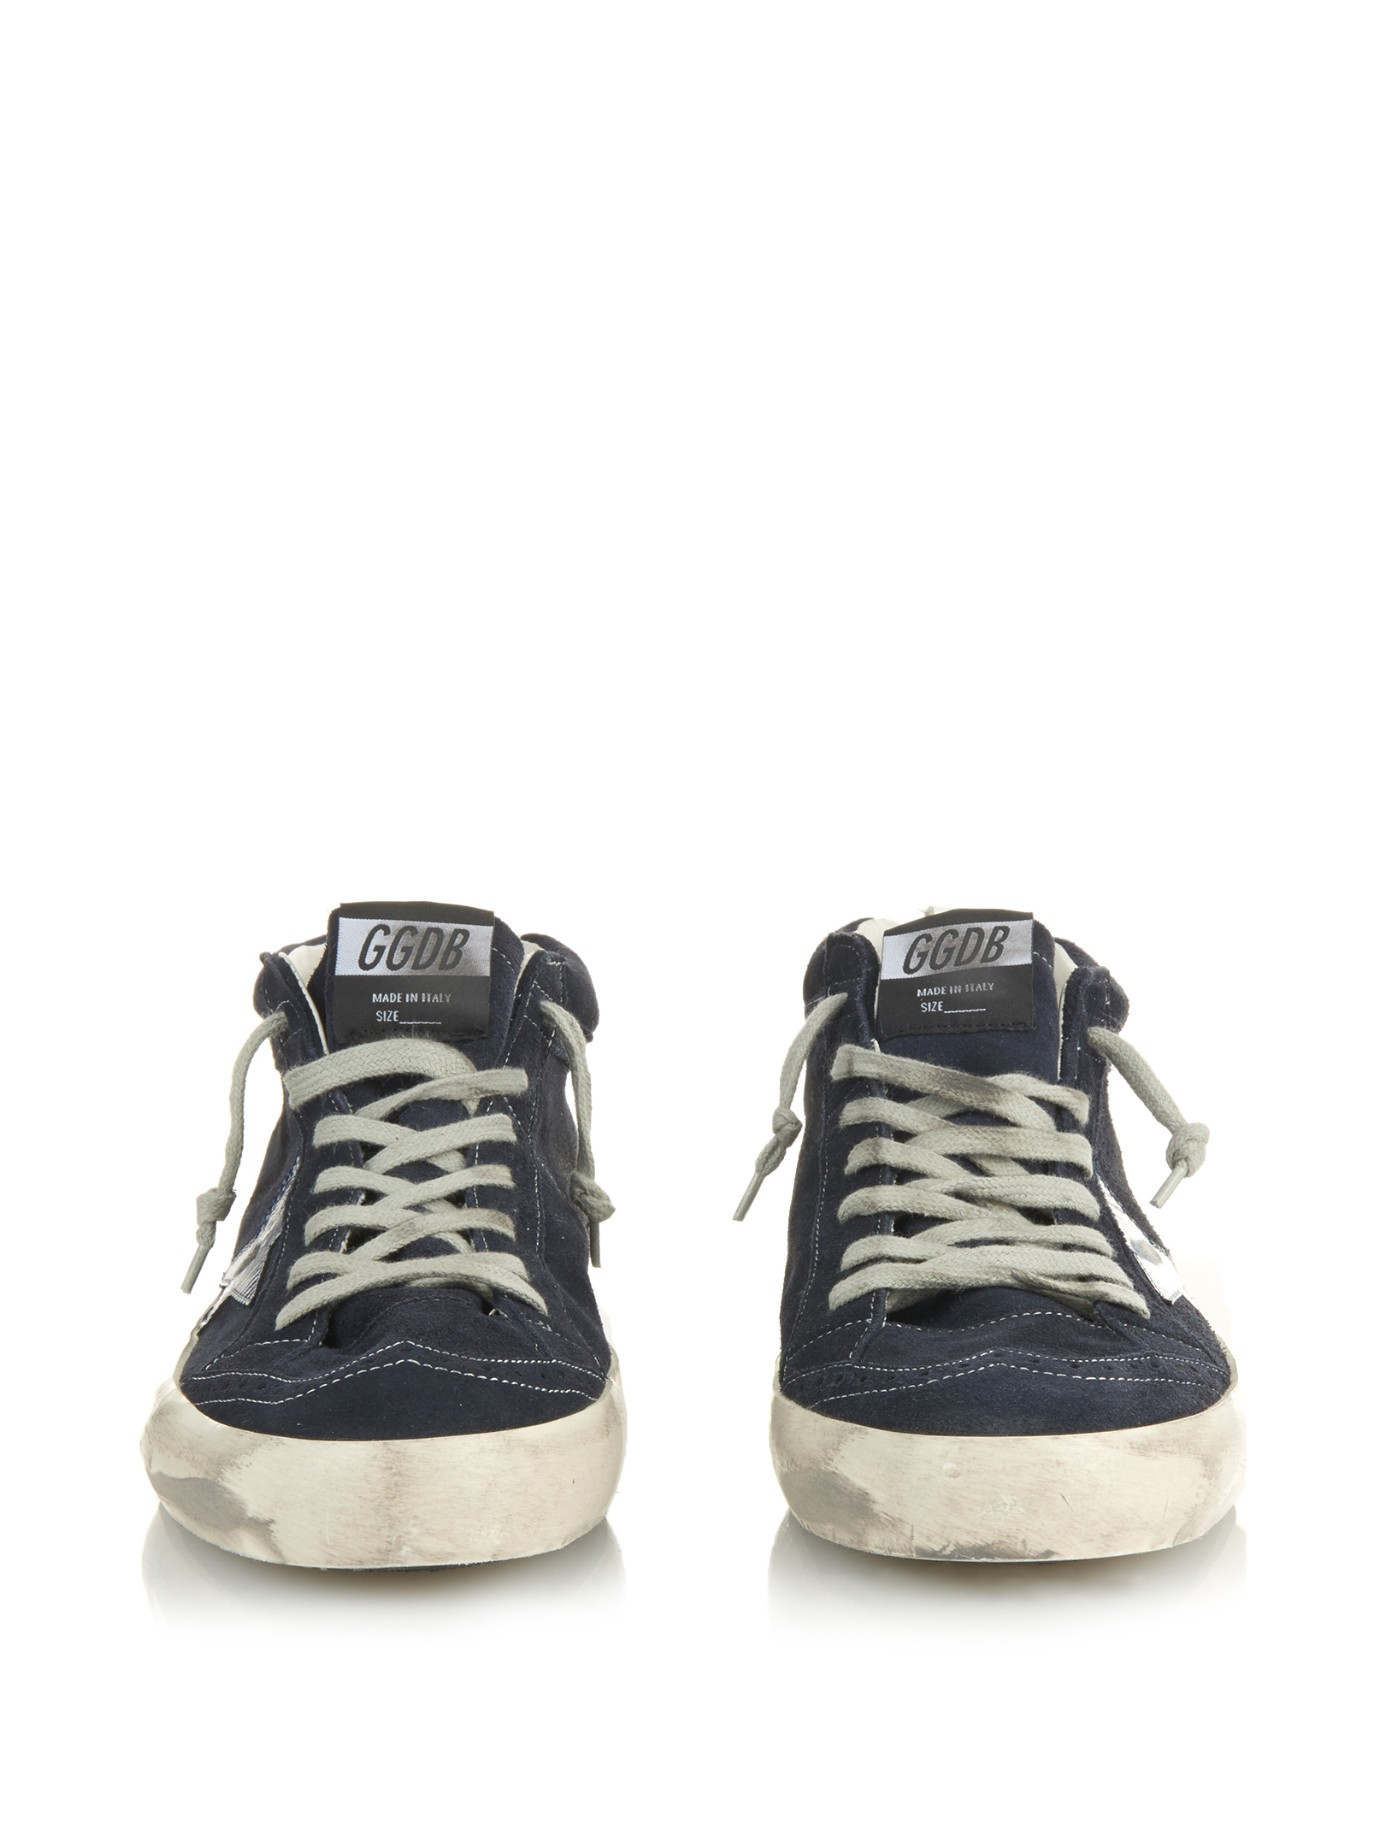 Lyst - Golden Goose Deluxe Brand Mid Star Suede Mid-Top Sneakers in Blue  for Men